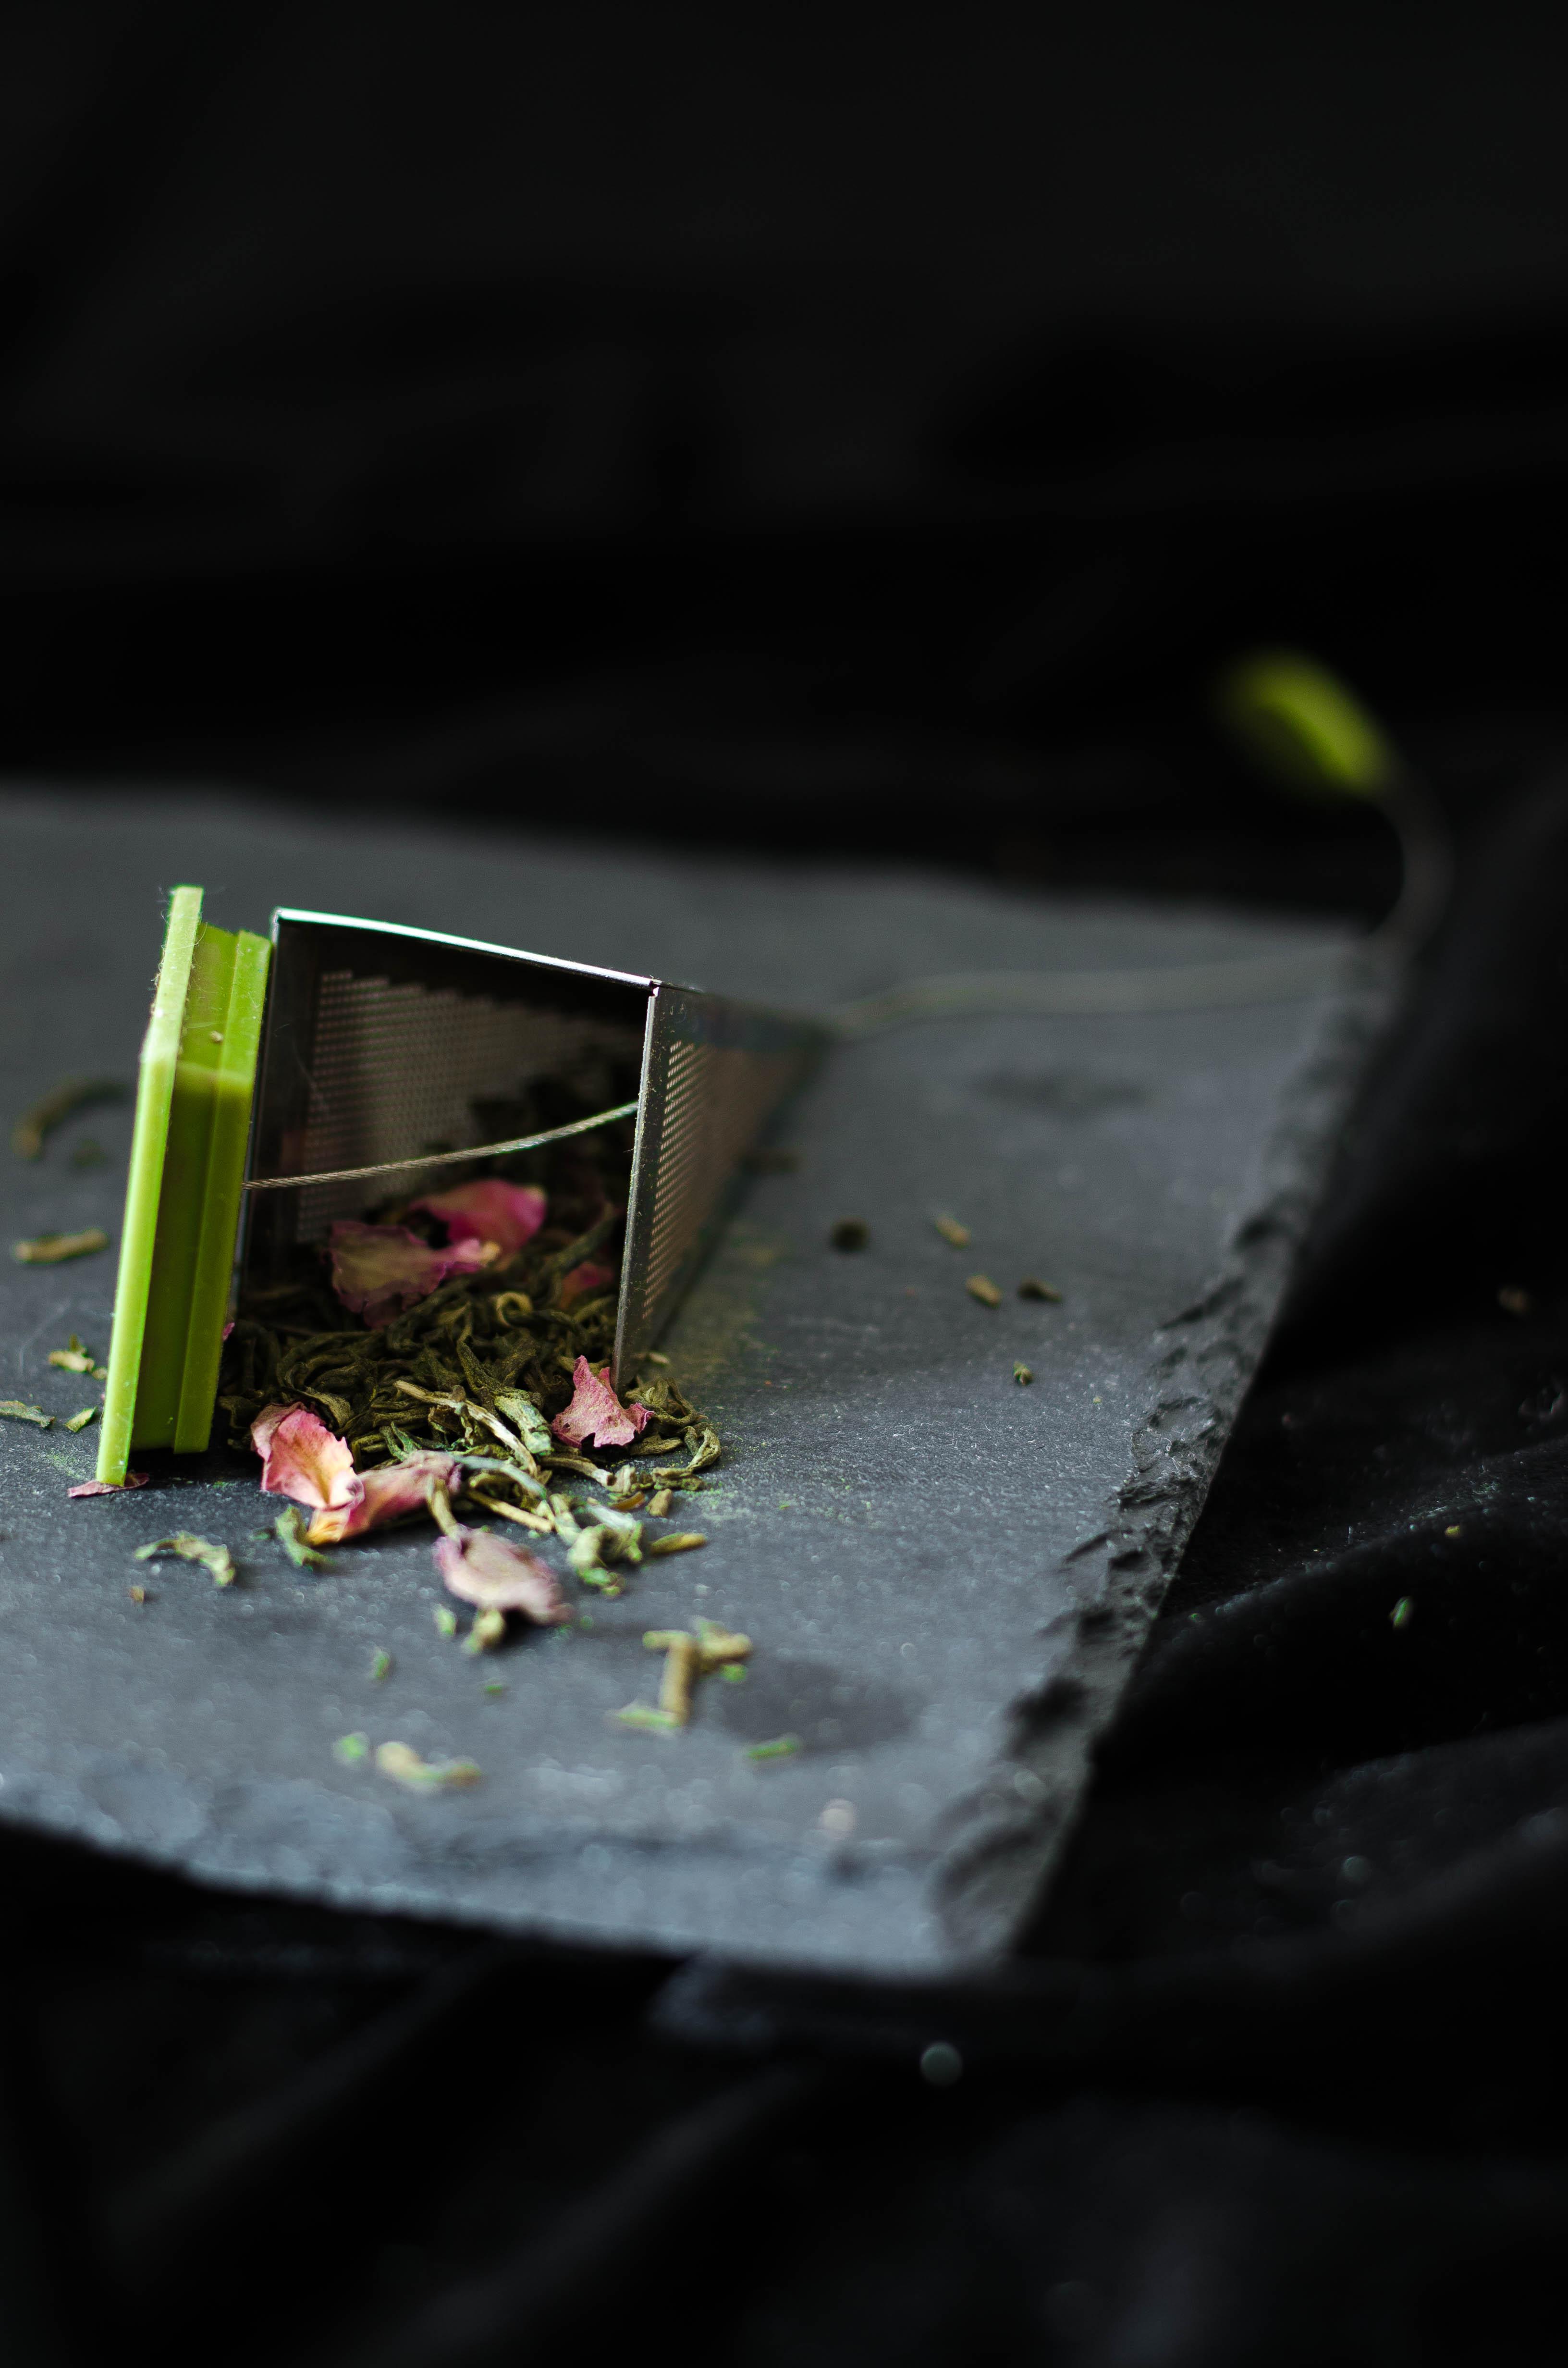 mou_matcha_rose3 Caramelle Mou al tè Matcha alle rose